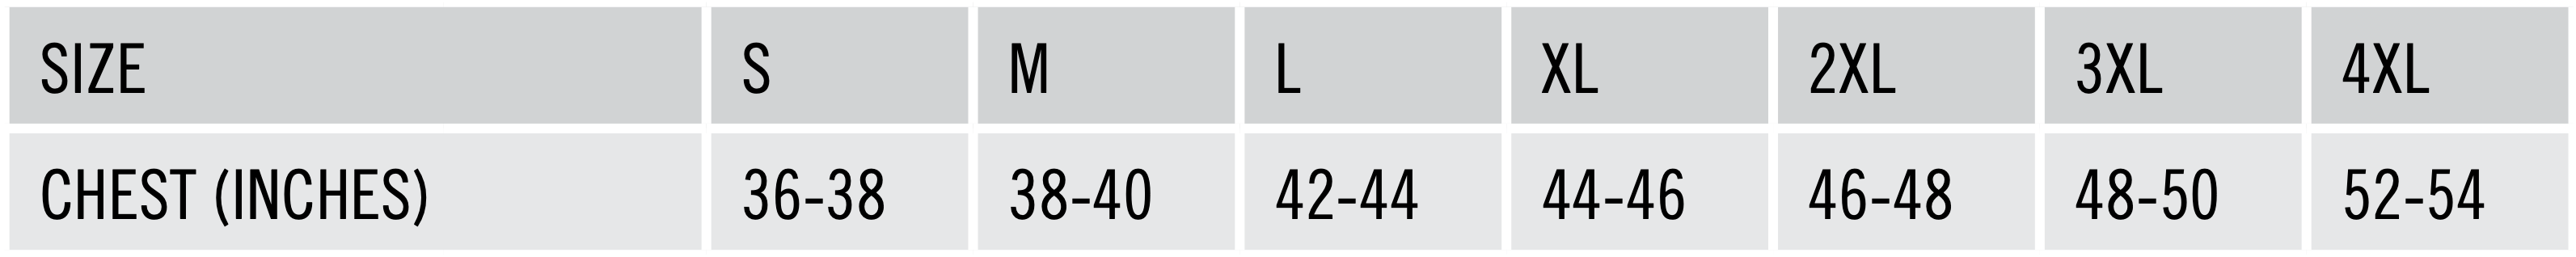 icon-vest-size-chart.png